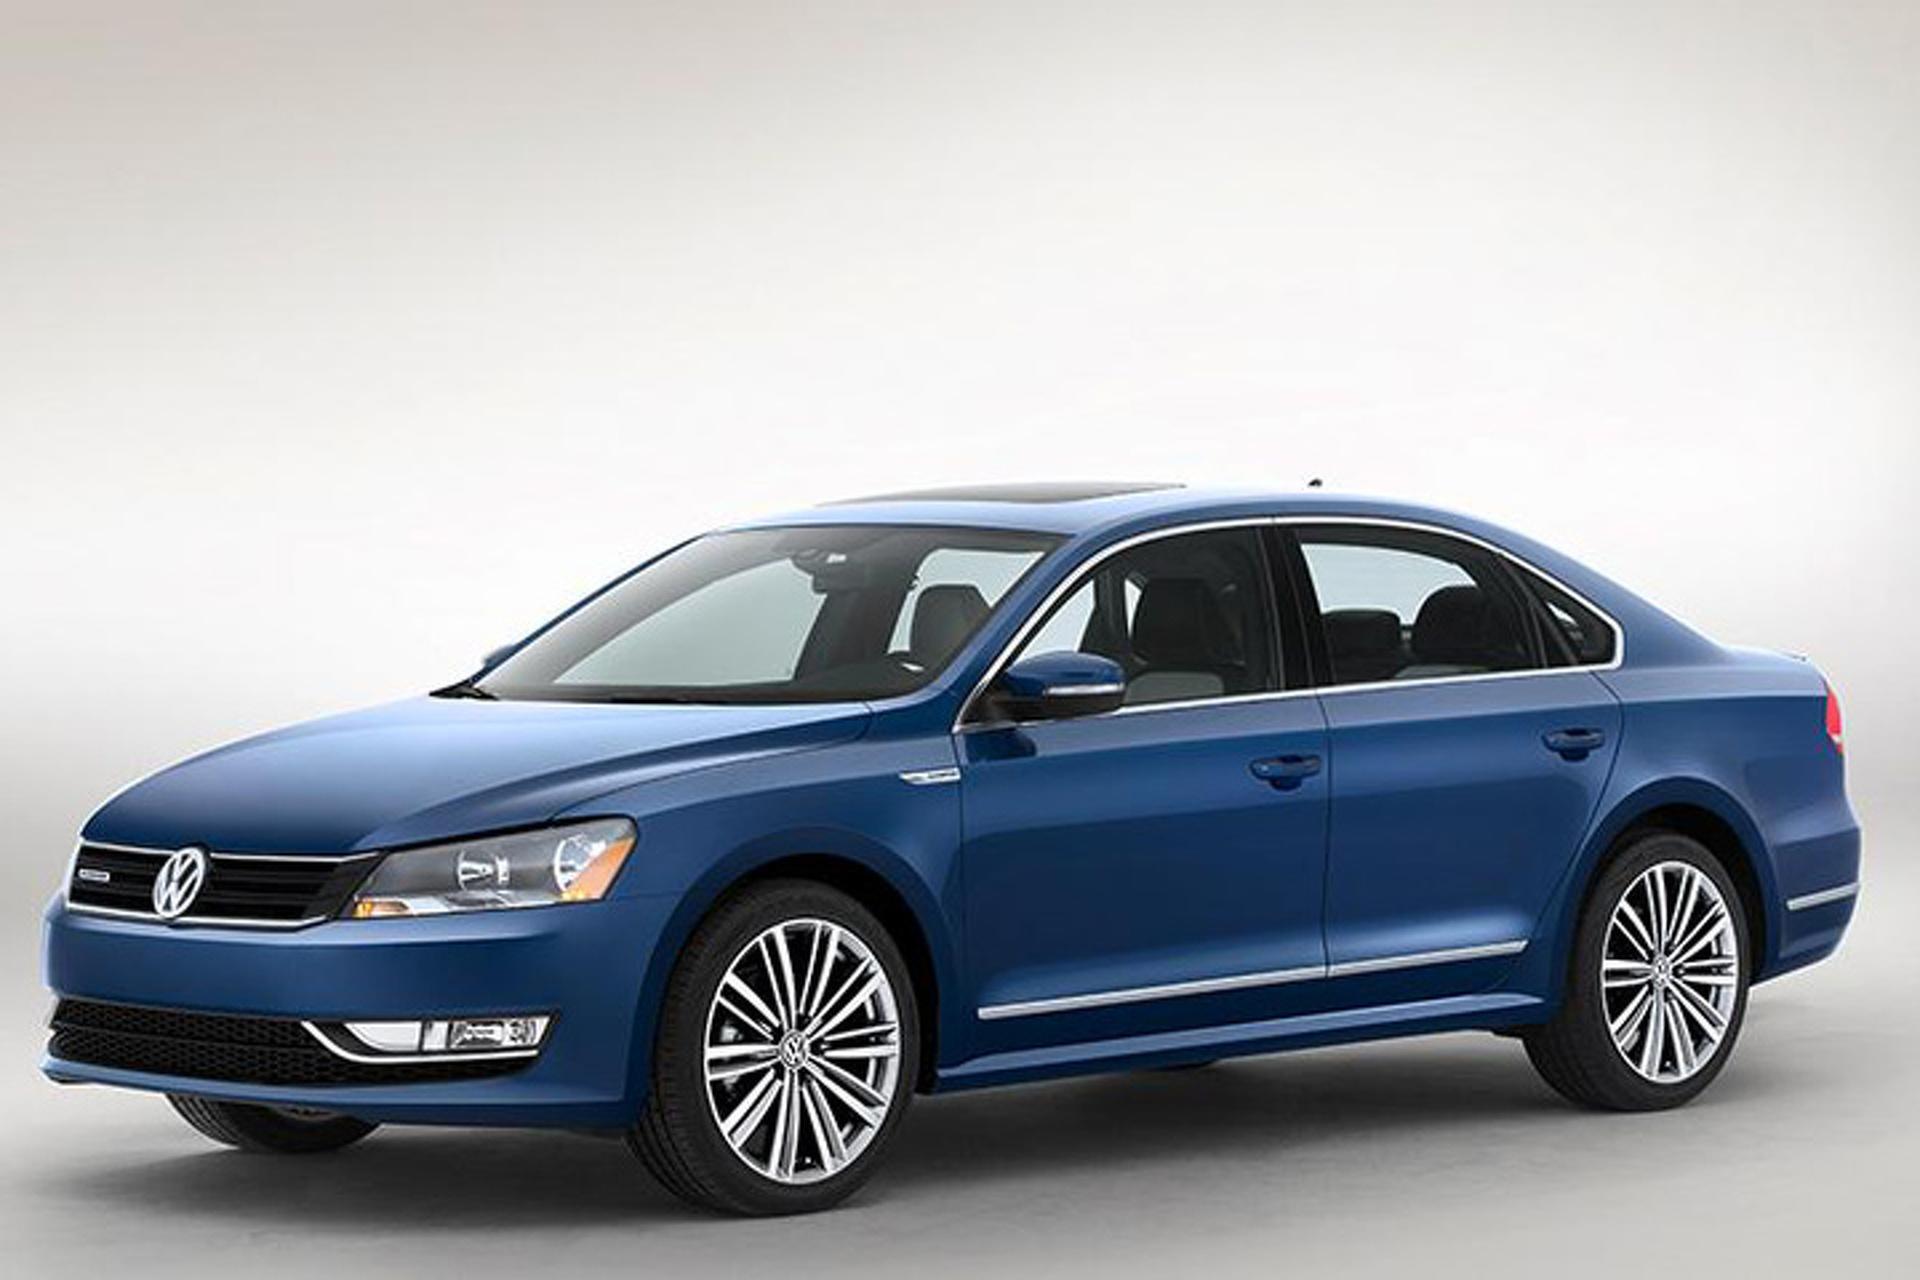 Volkswagen's 10-Speed DSG Gearbox is a Definite